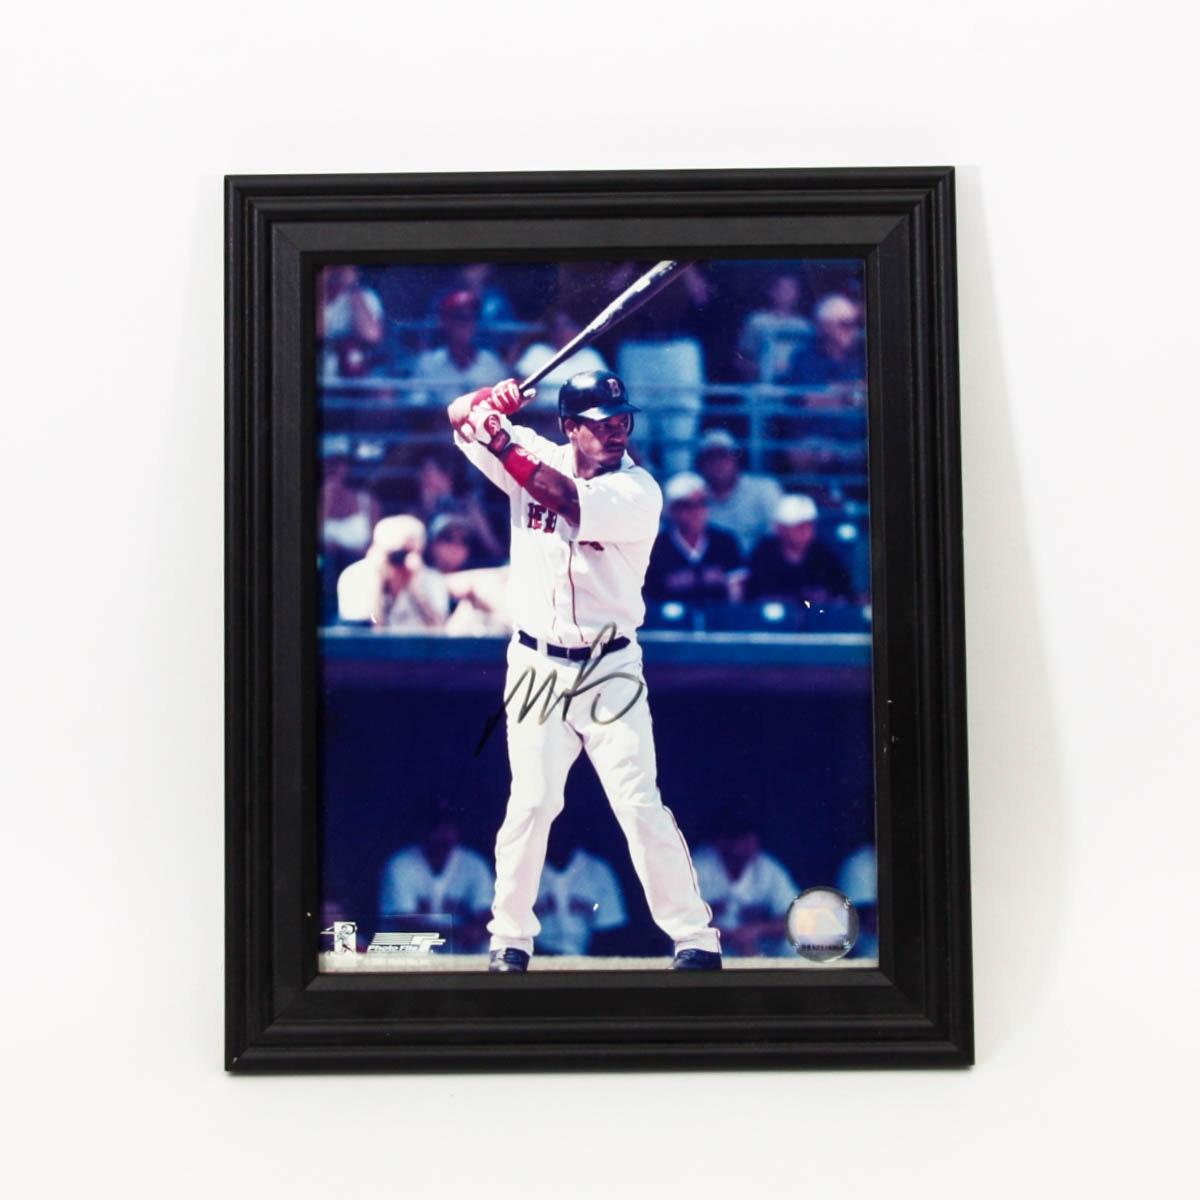 Manny Ramirez Red Sox Autographed Photo